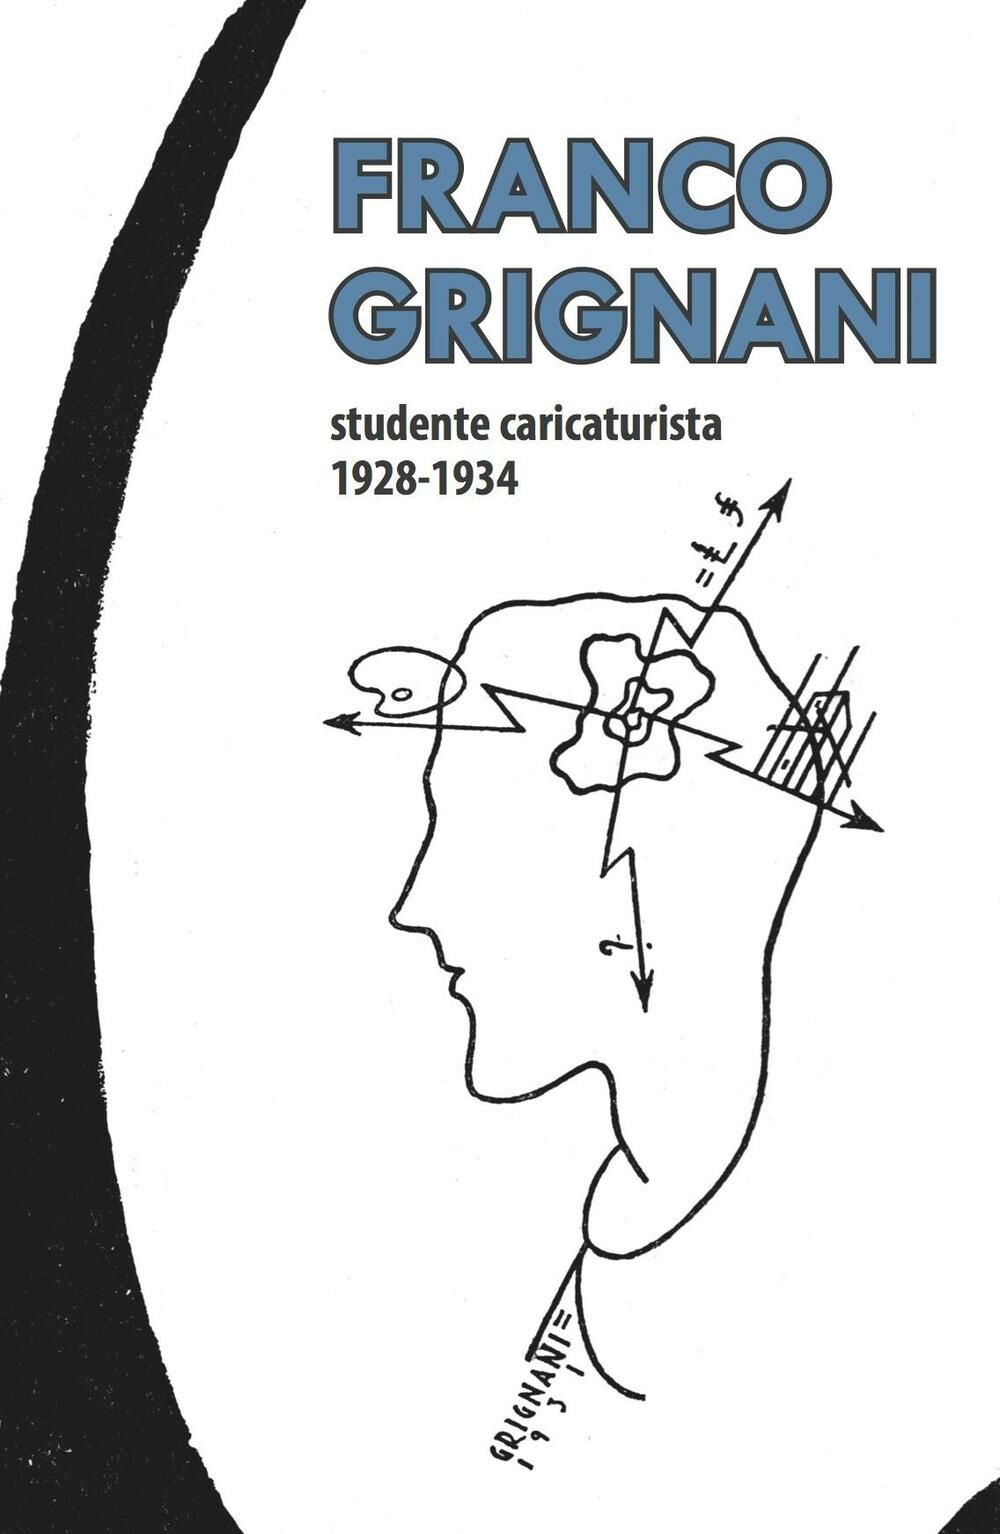 Franco Grignani studente caricaturista 1928-1934